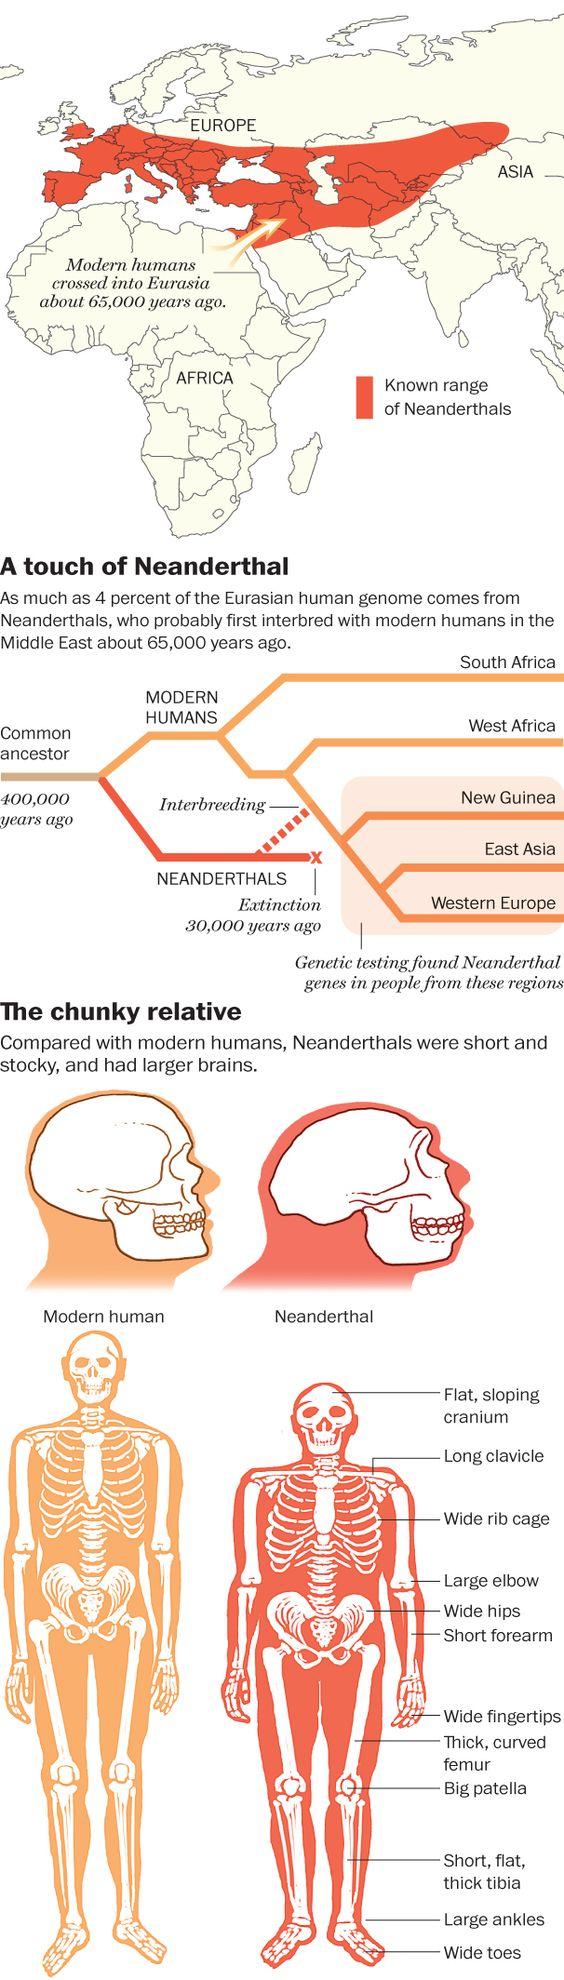 Decoding and Rethinking Neanderthals